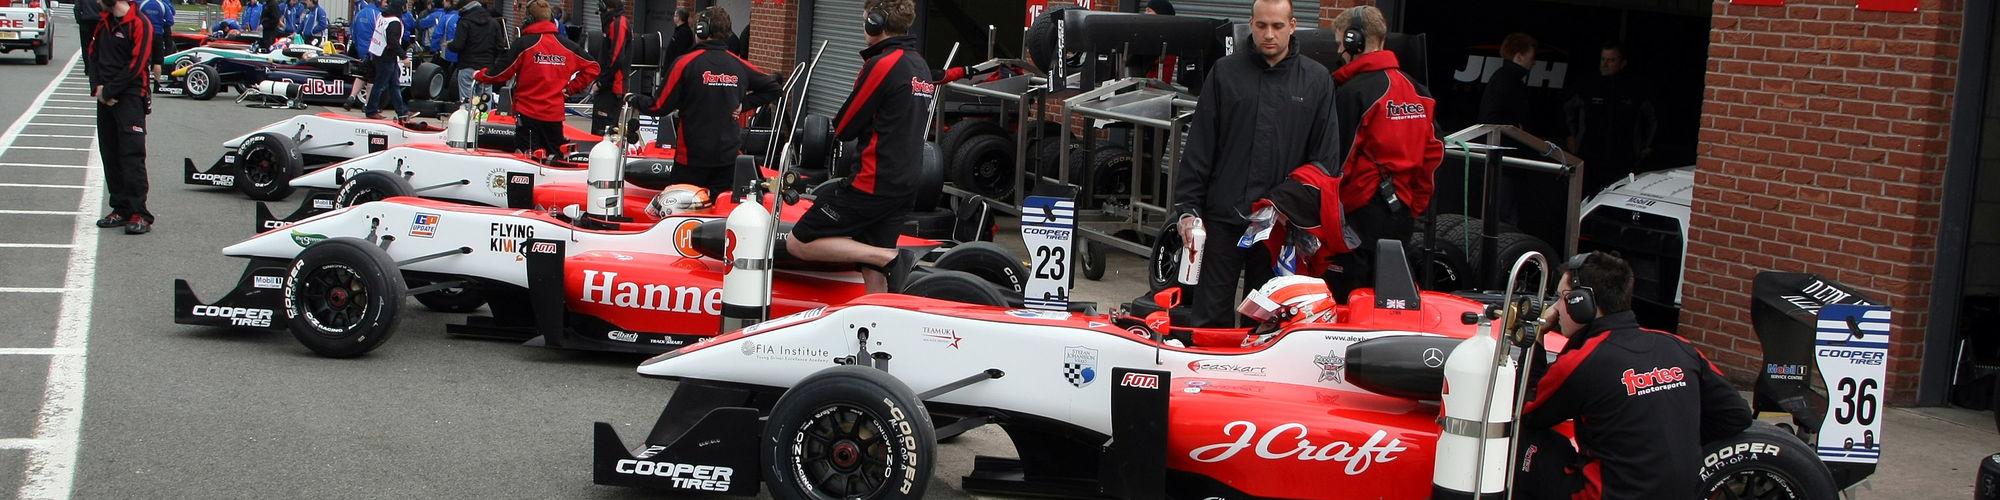 Fortec Motorsports Ltd